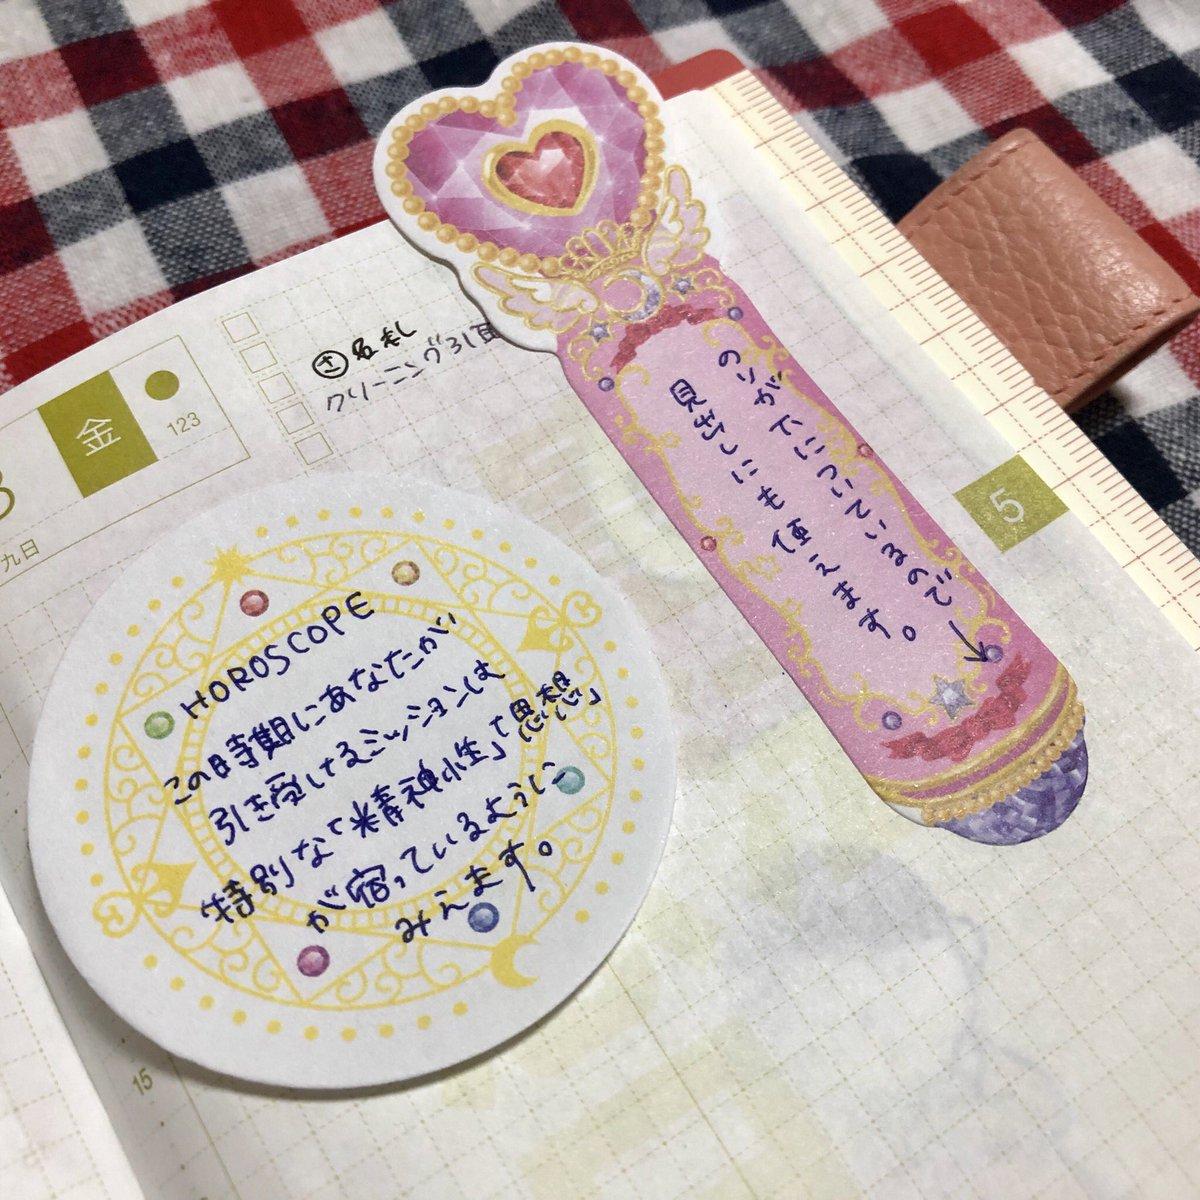 test ツイッターメディア - #キャンドゥ で魔法少女風のブック型付箋も購入〜✨可愛いー!娘と一緒に使います( ´ ▽ ` )♪ https://t.co/6VaFJIfMlr